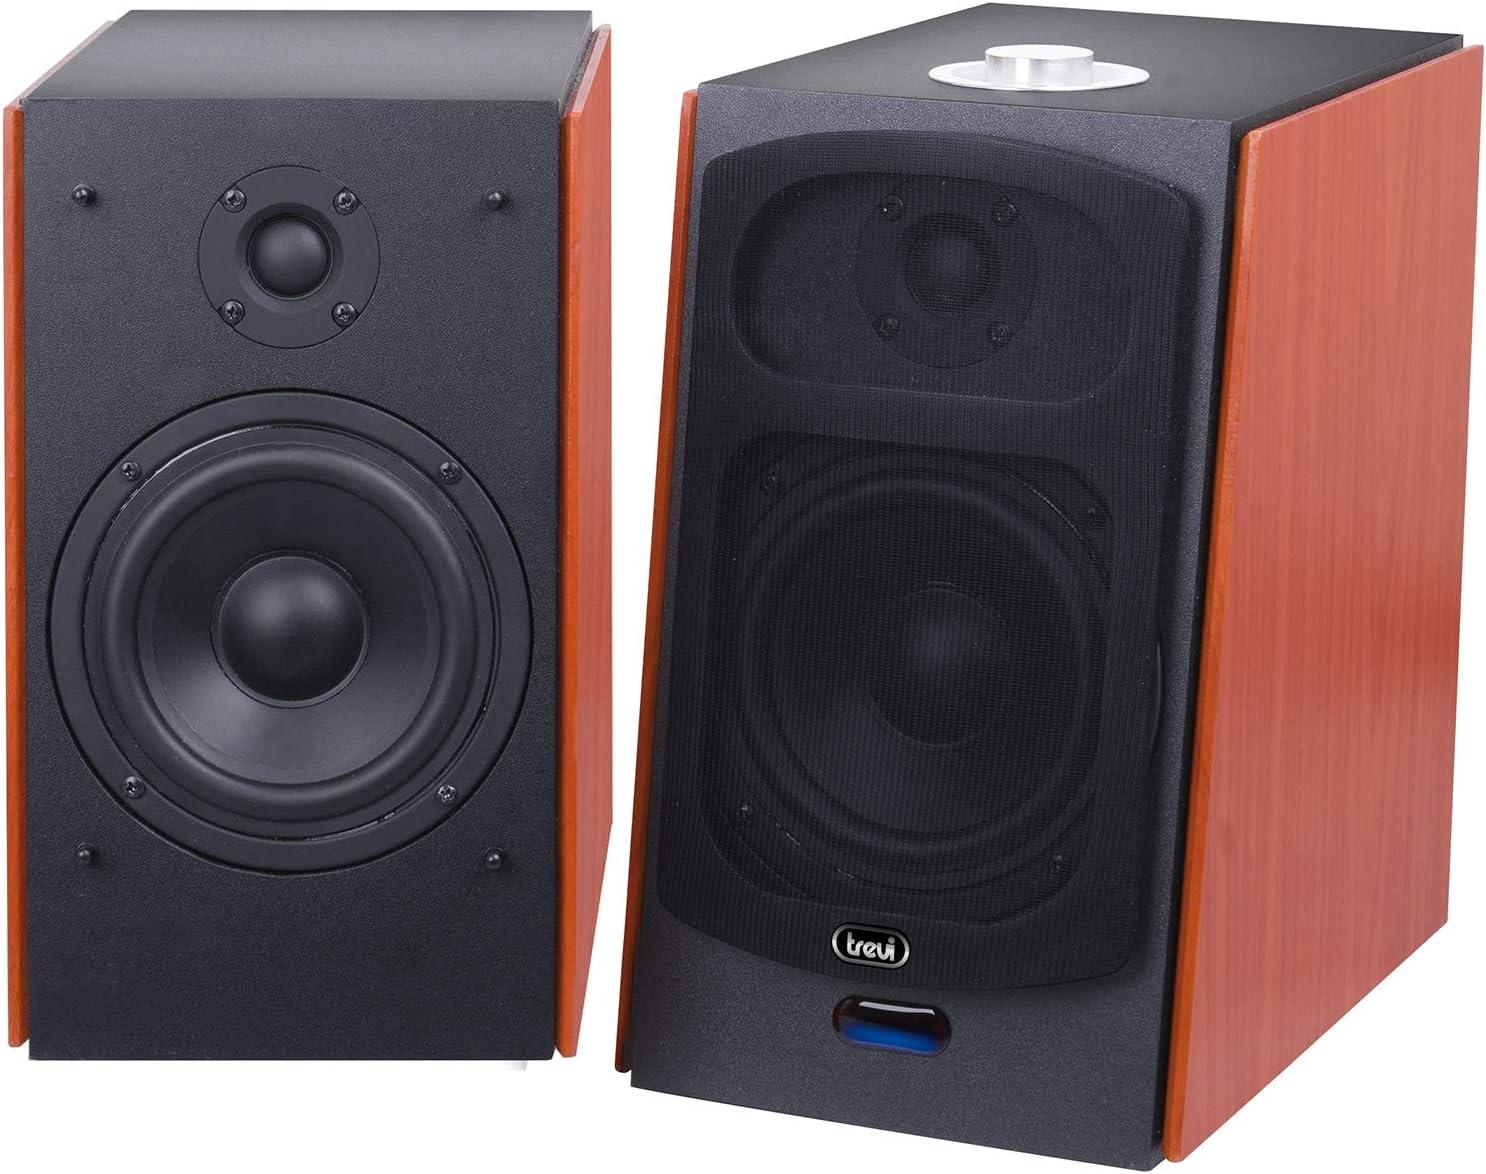 Trevi AVX 590 BT Altavoz 120 W Negro, Madera - Altavoces (De 2 vías, Inalámbrico y alámbrico, 3.5mm/USB/Bluetooth, 120 W, 50-20000 Hz, Negro, Madera)